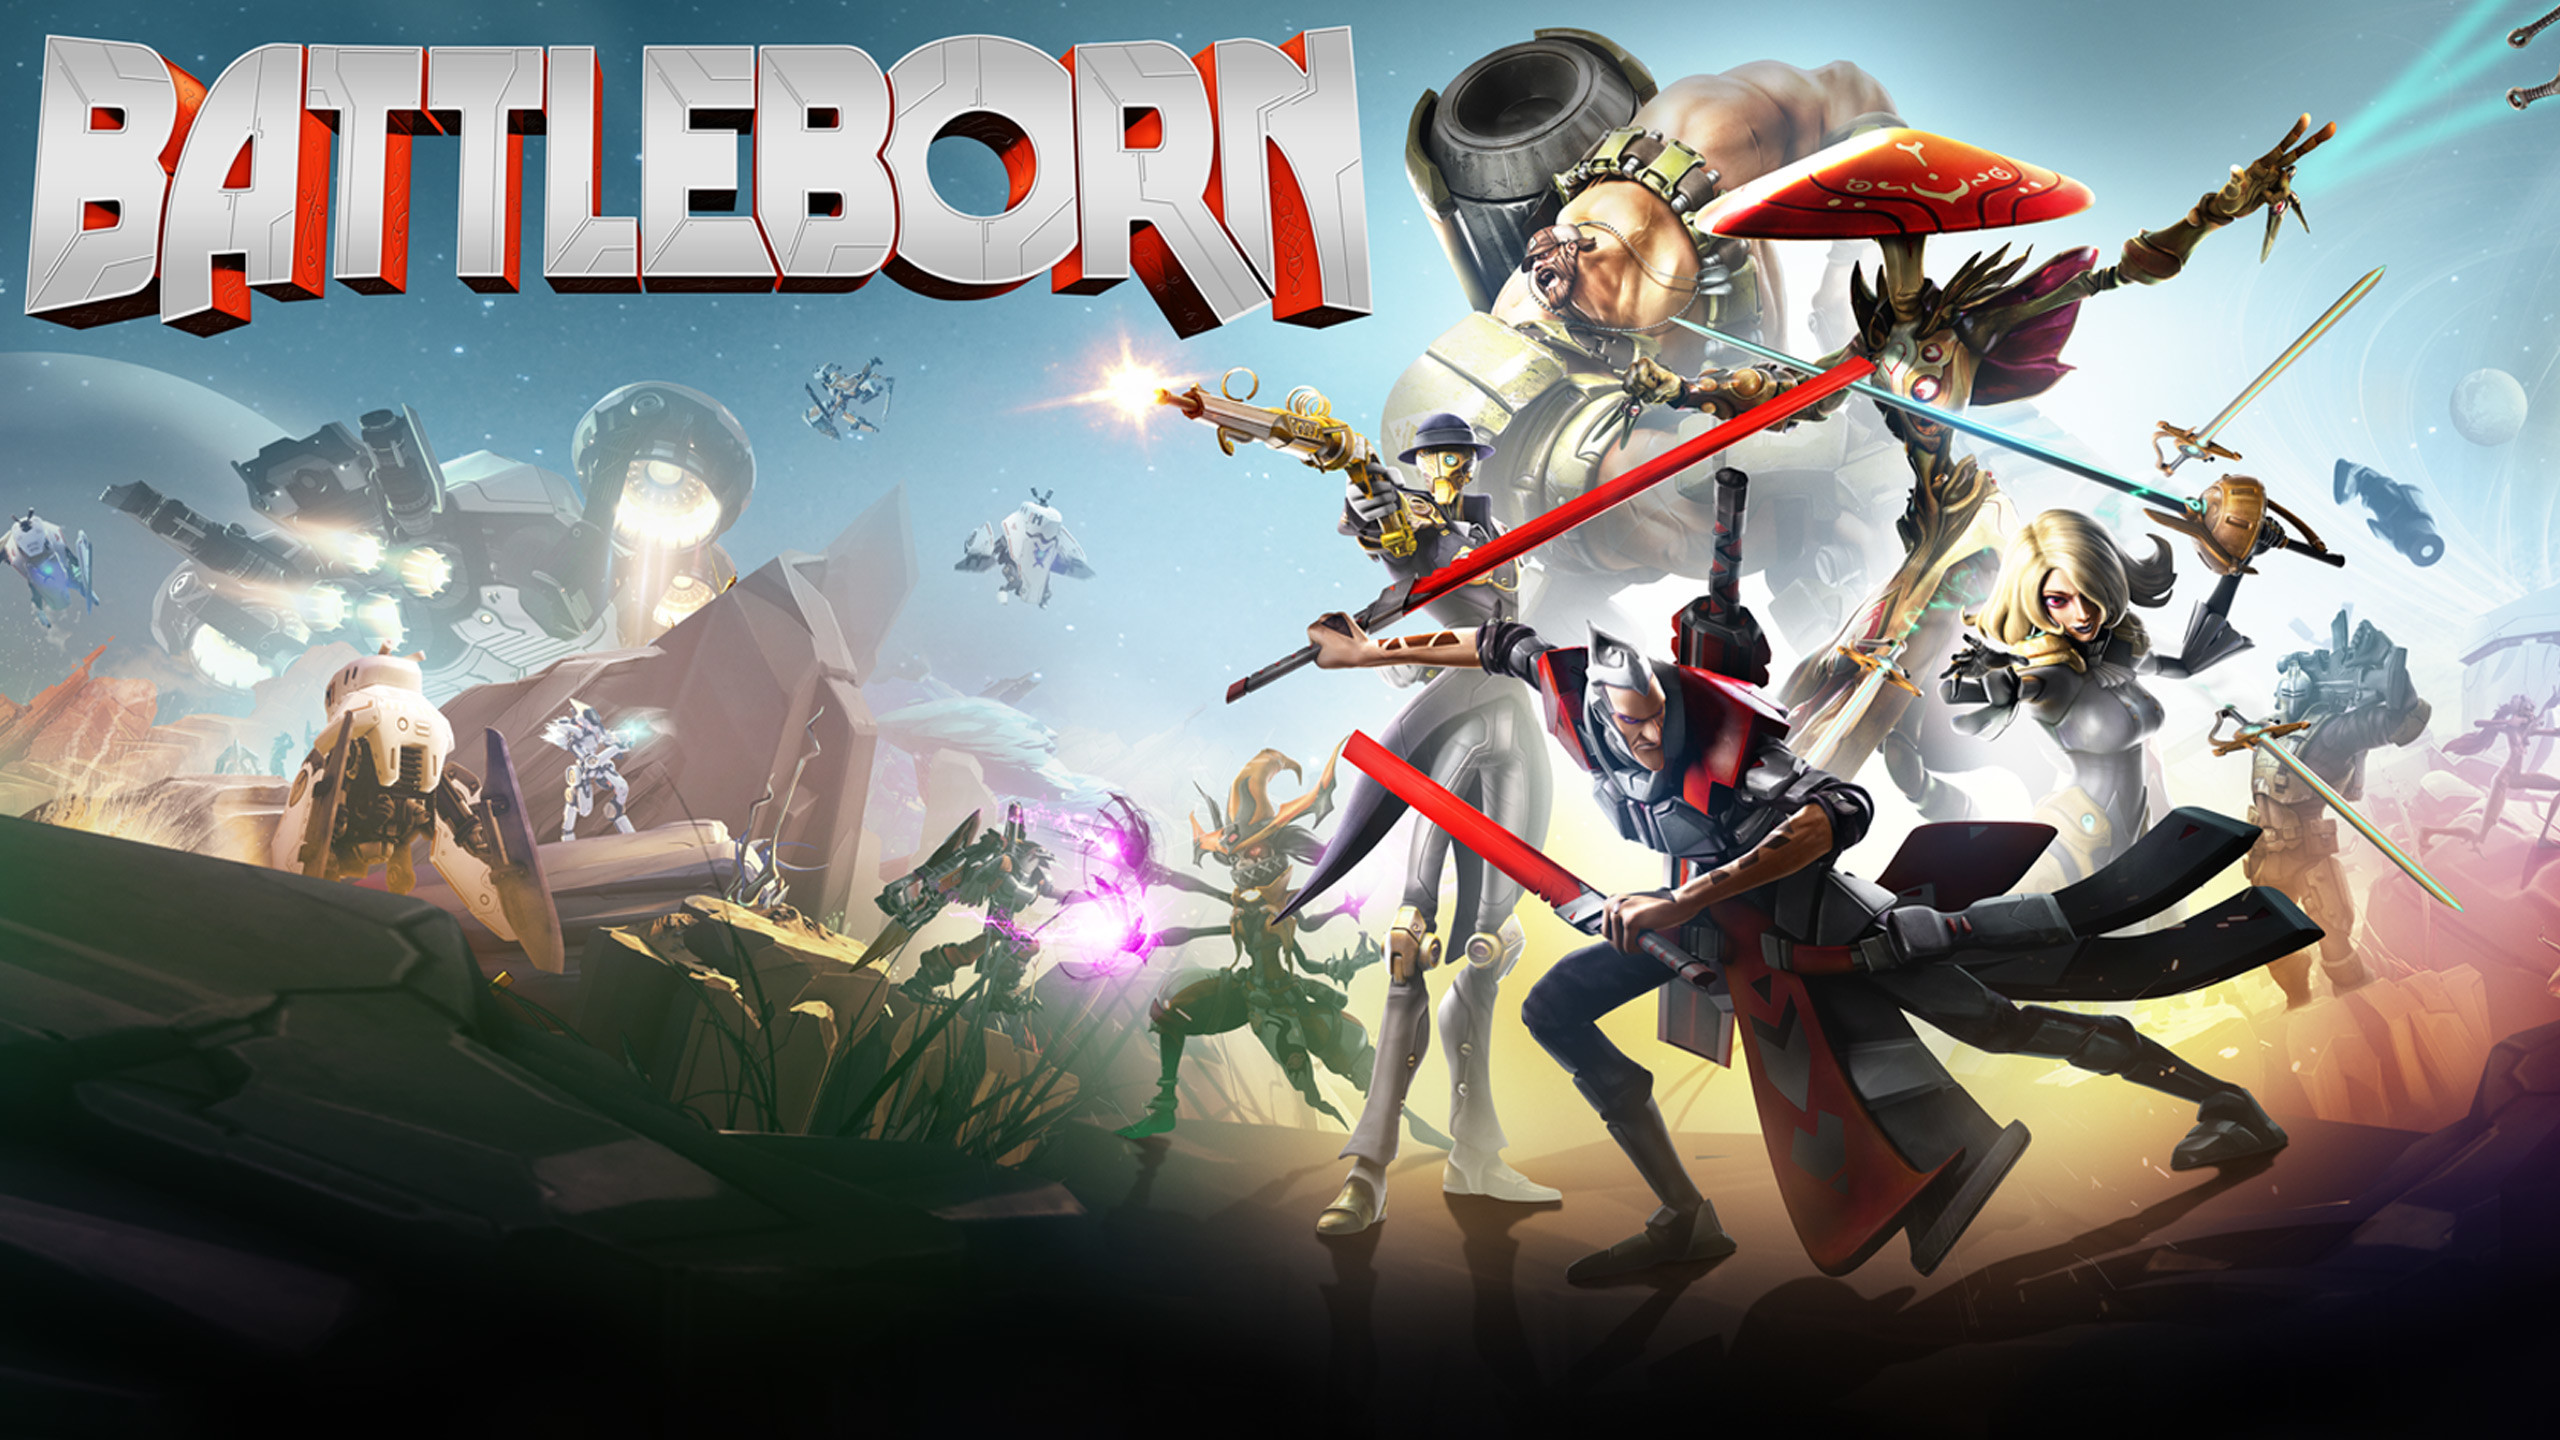 Battleborn Cover Game Wallpaper Wallpaper